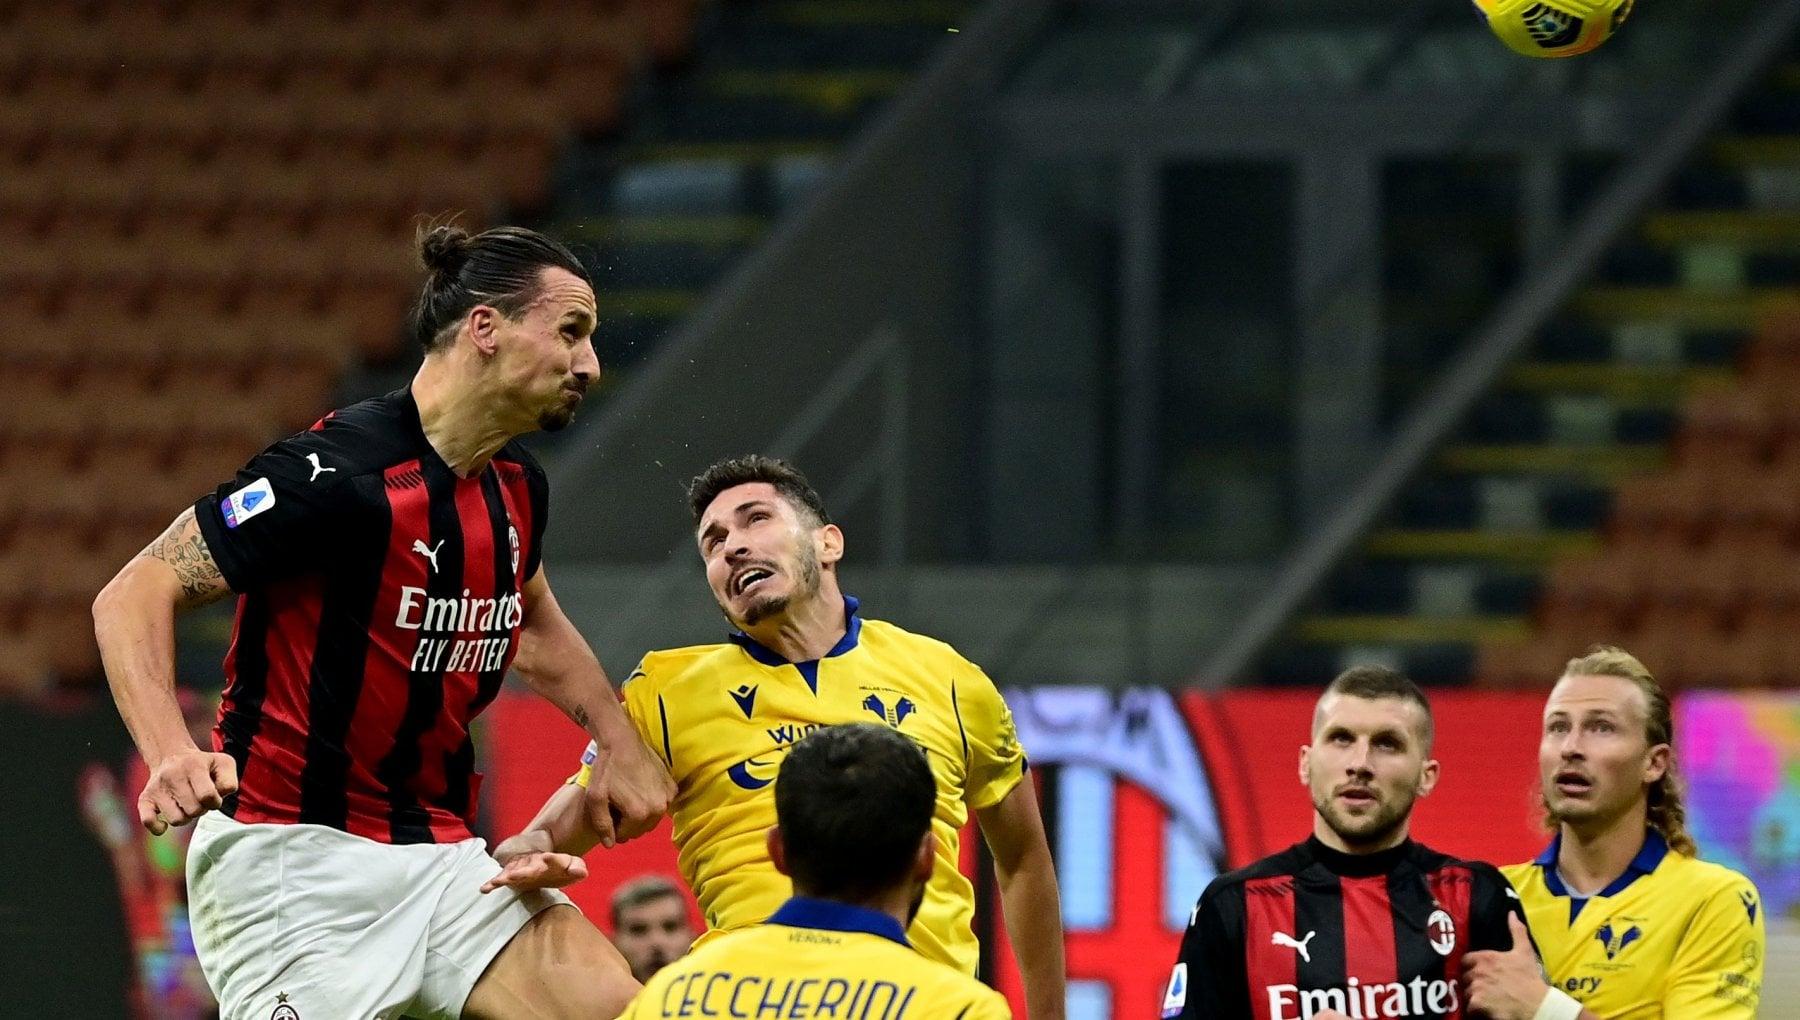 Milan Verona 2 2 Ibrahimovic prima sbaglia un rigore poi salva i rossoneri al 92